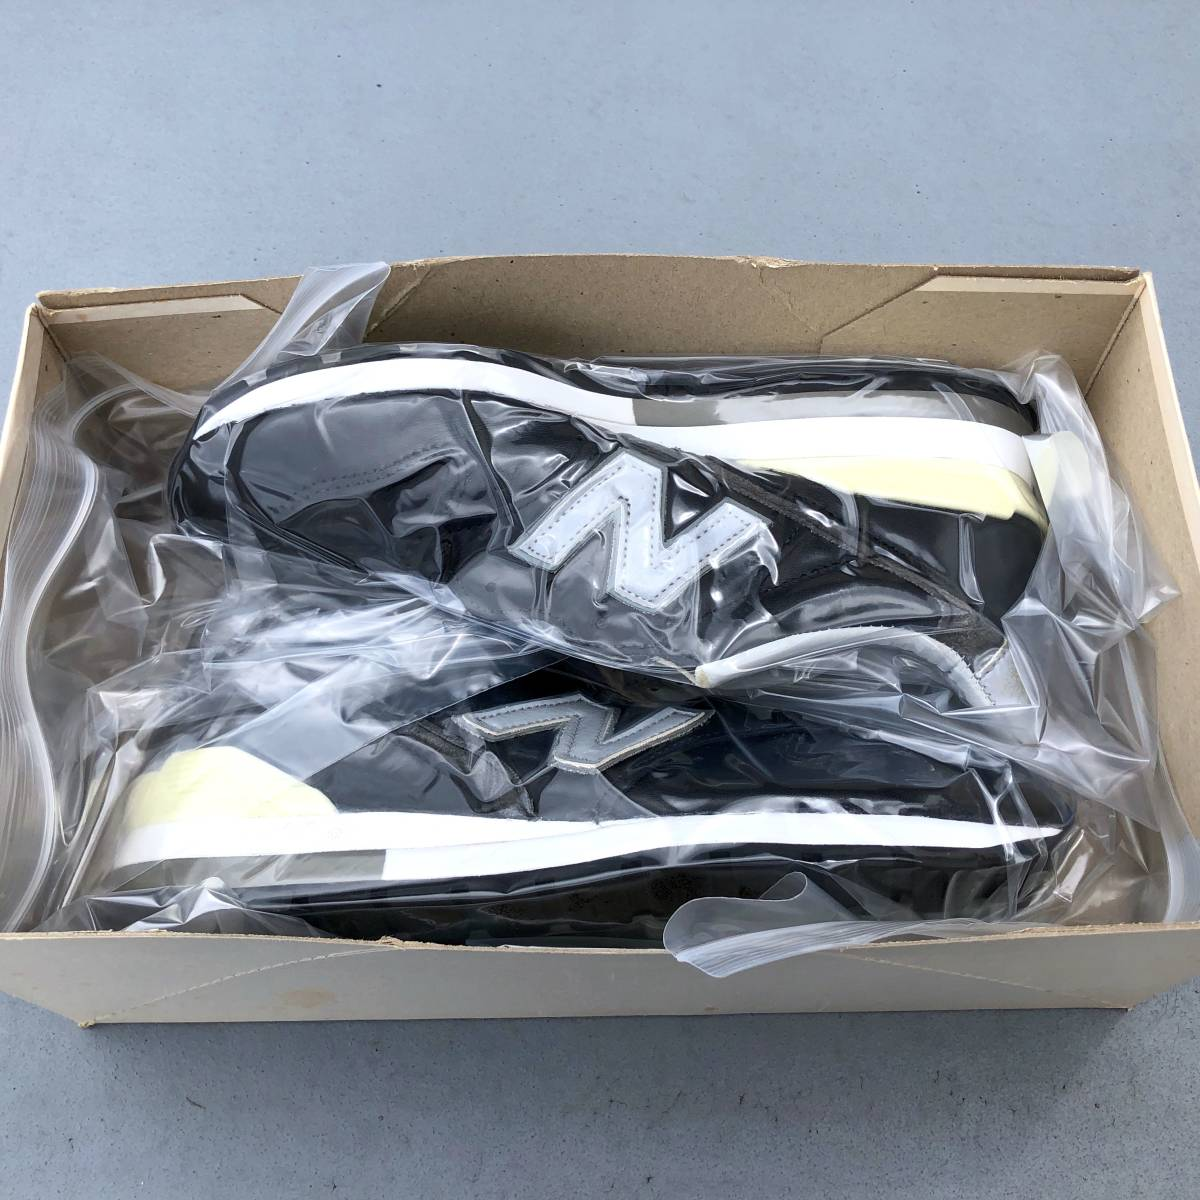 NB公式リペア済 デッドストック 90s USA製 NEW BALANCE M996LB US8D 26cm オールレザー ビンテージ 新品 アメリカ米国製 ブラック×グレー_画像10